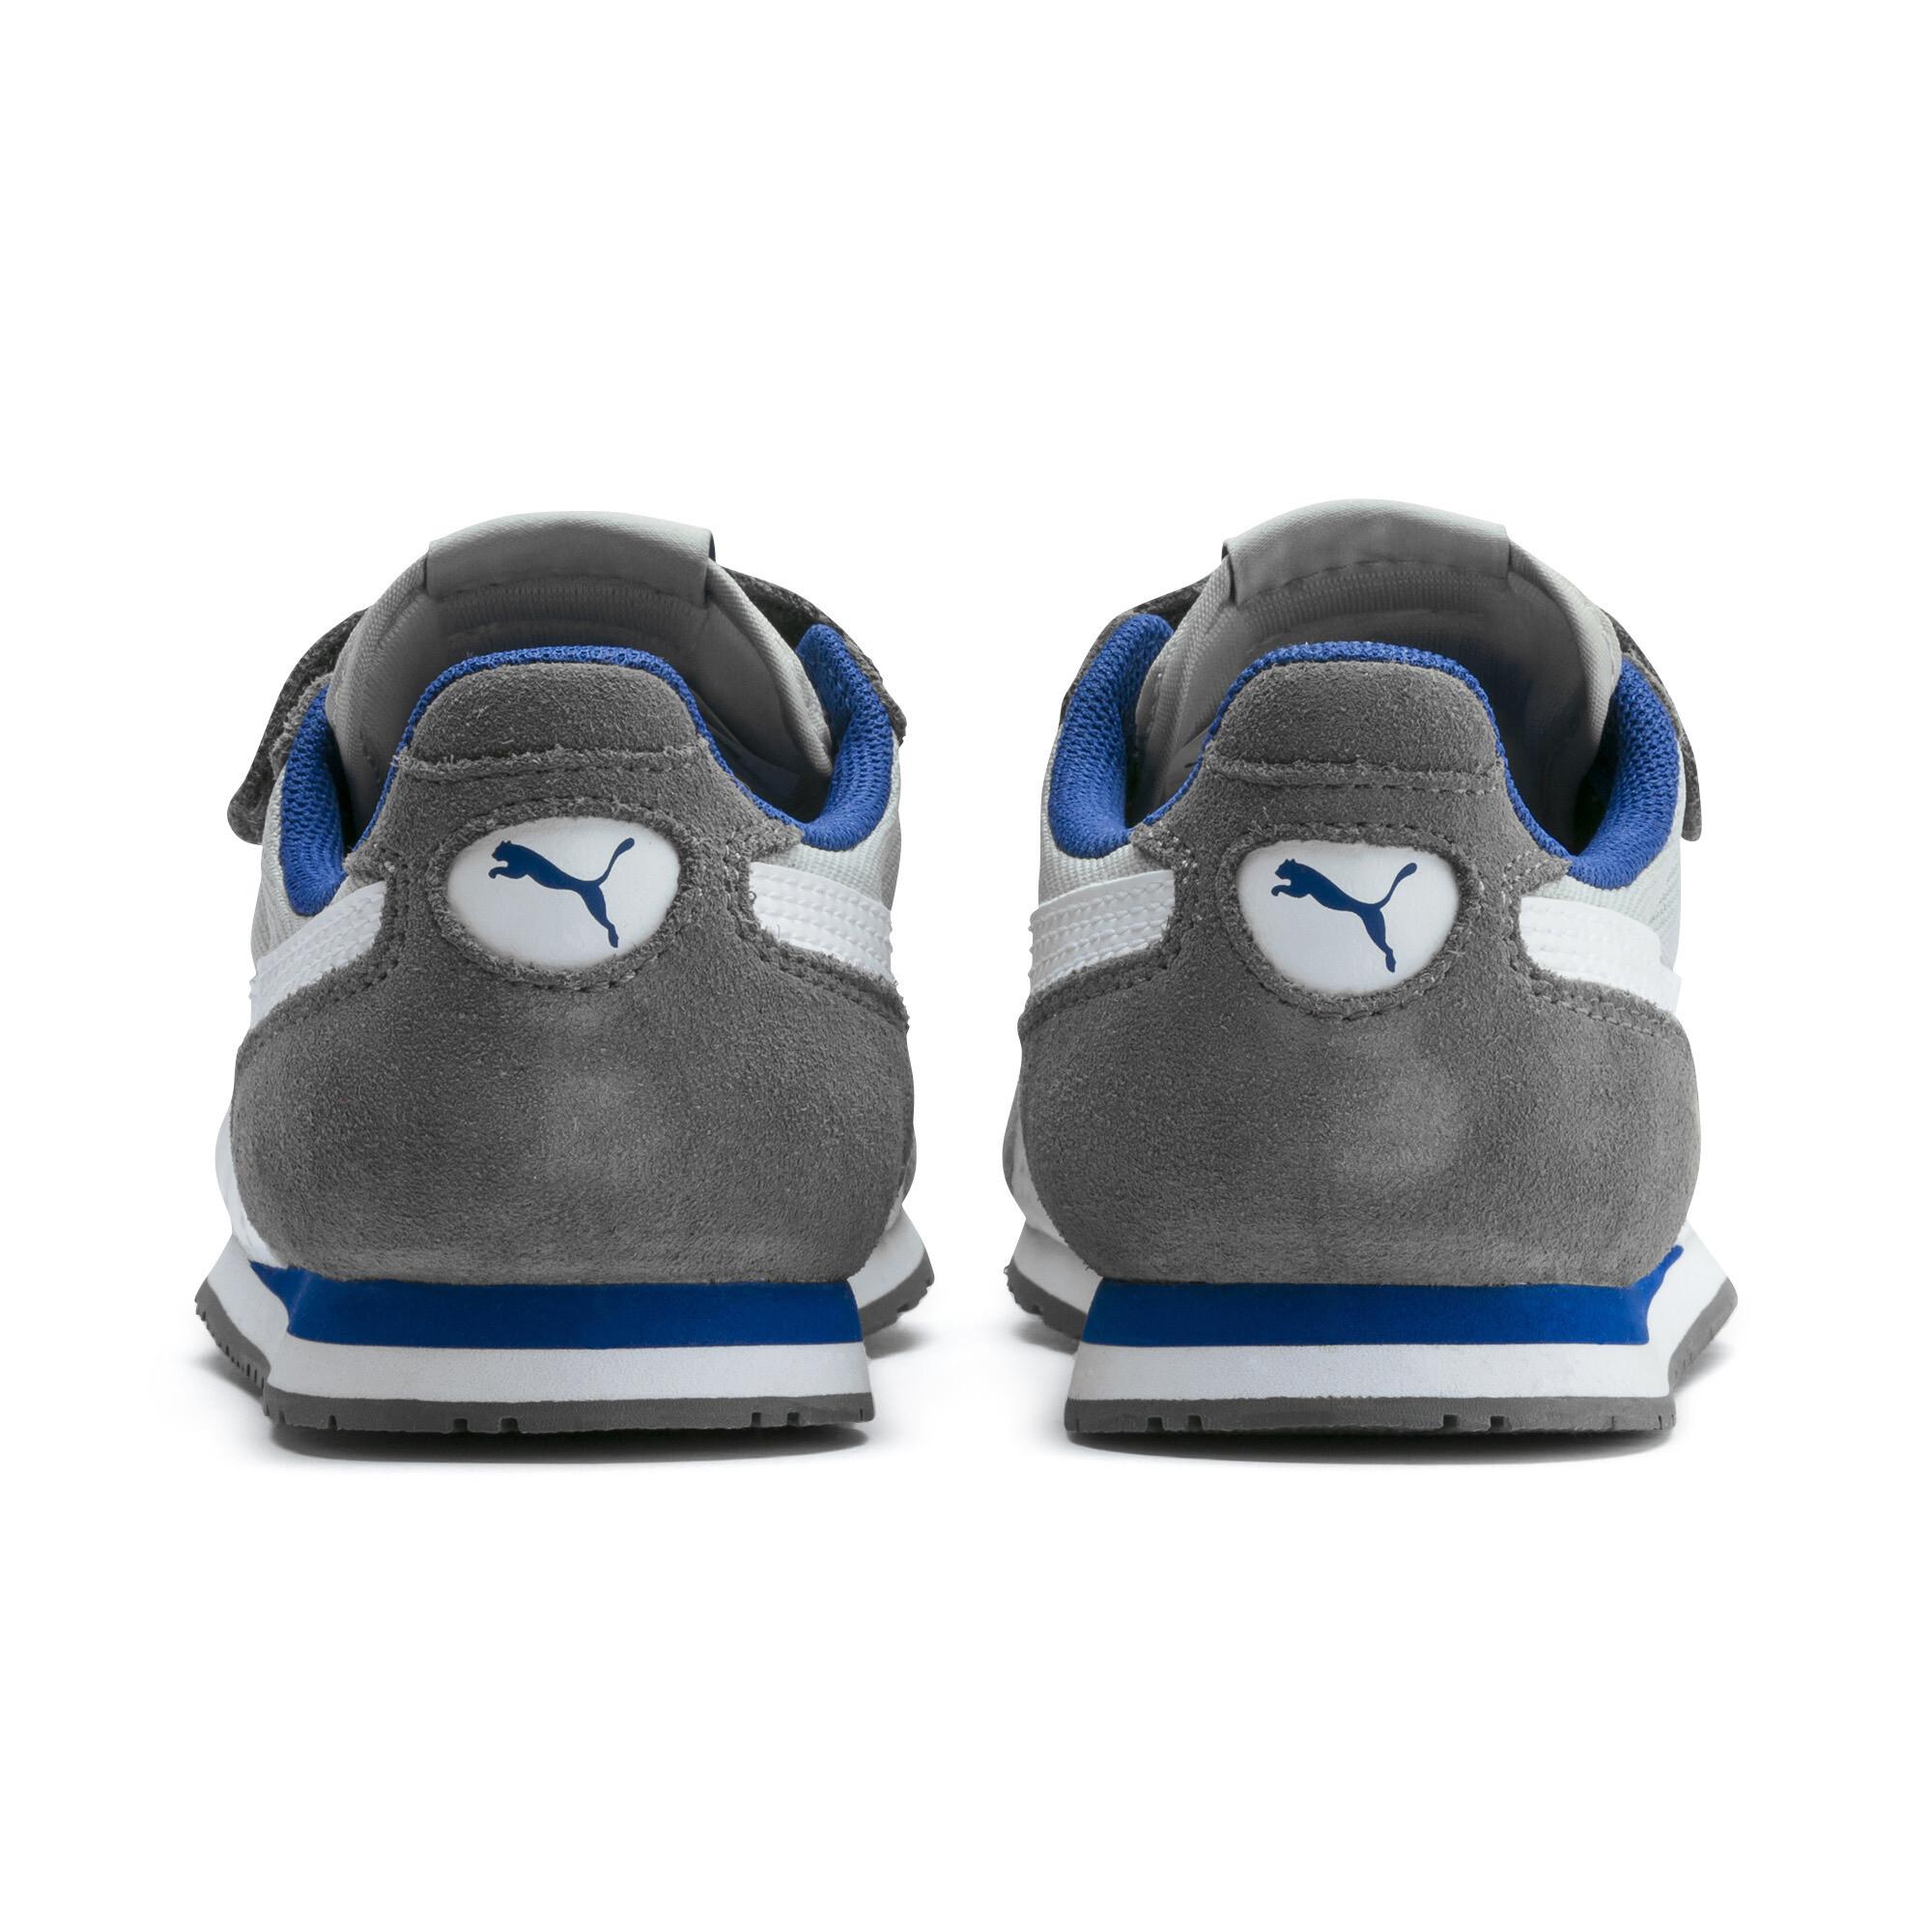 PUMA-Cabana-Racer-Little-Kids-039-Shoes-Kids-Shoe-Kids thumbnail 9